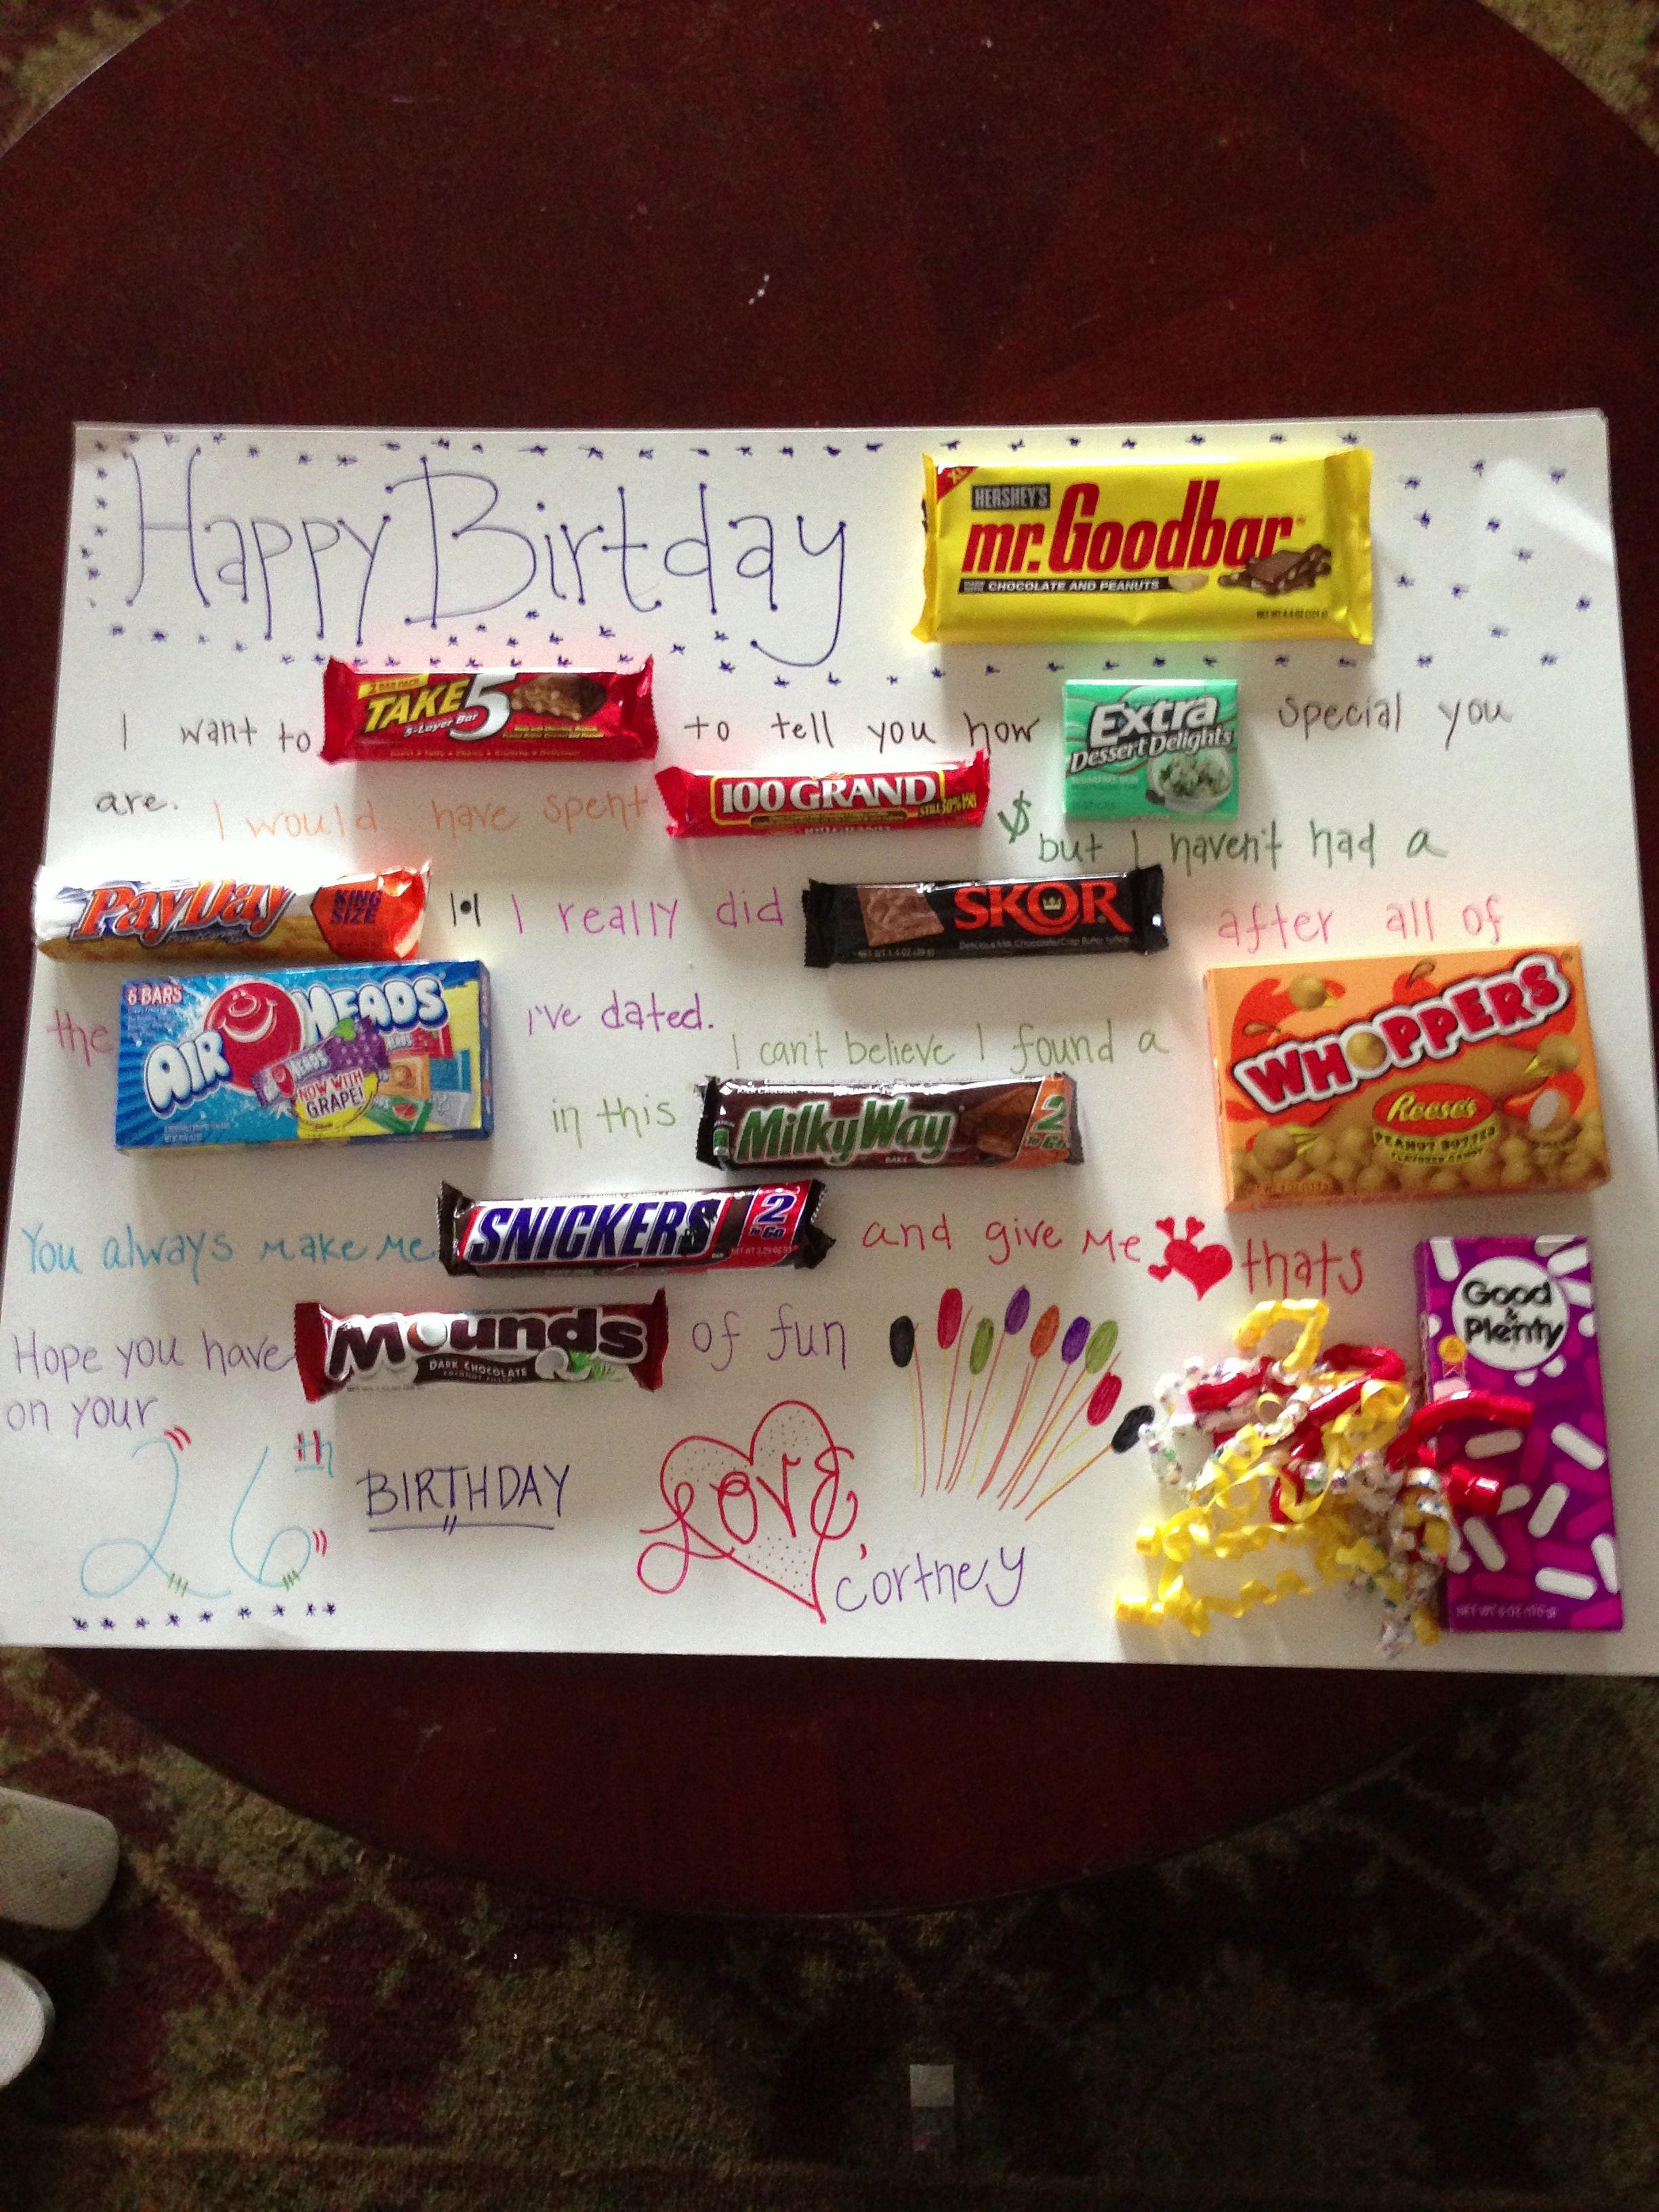 Best ideas about Gift Ideas For Boyfriends Birthday . Save or Pin For the boyfriends birthday Now.